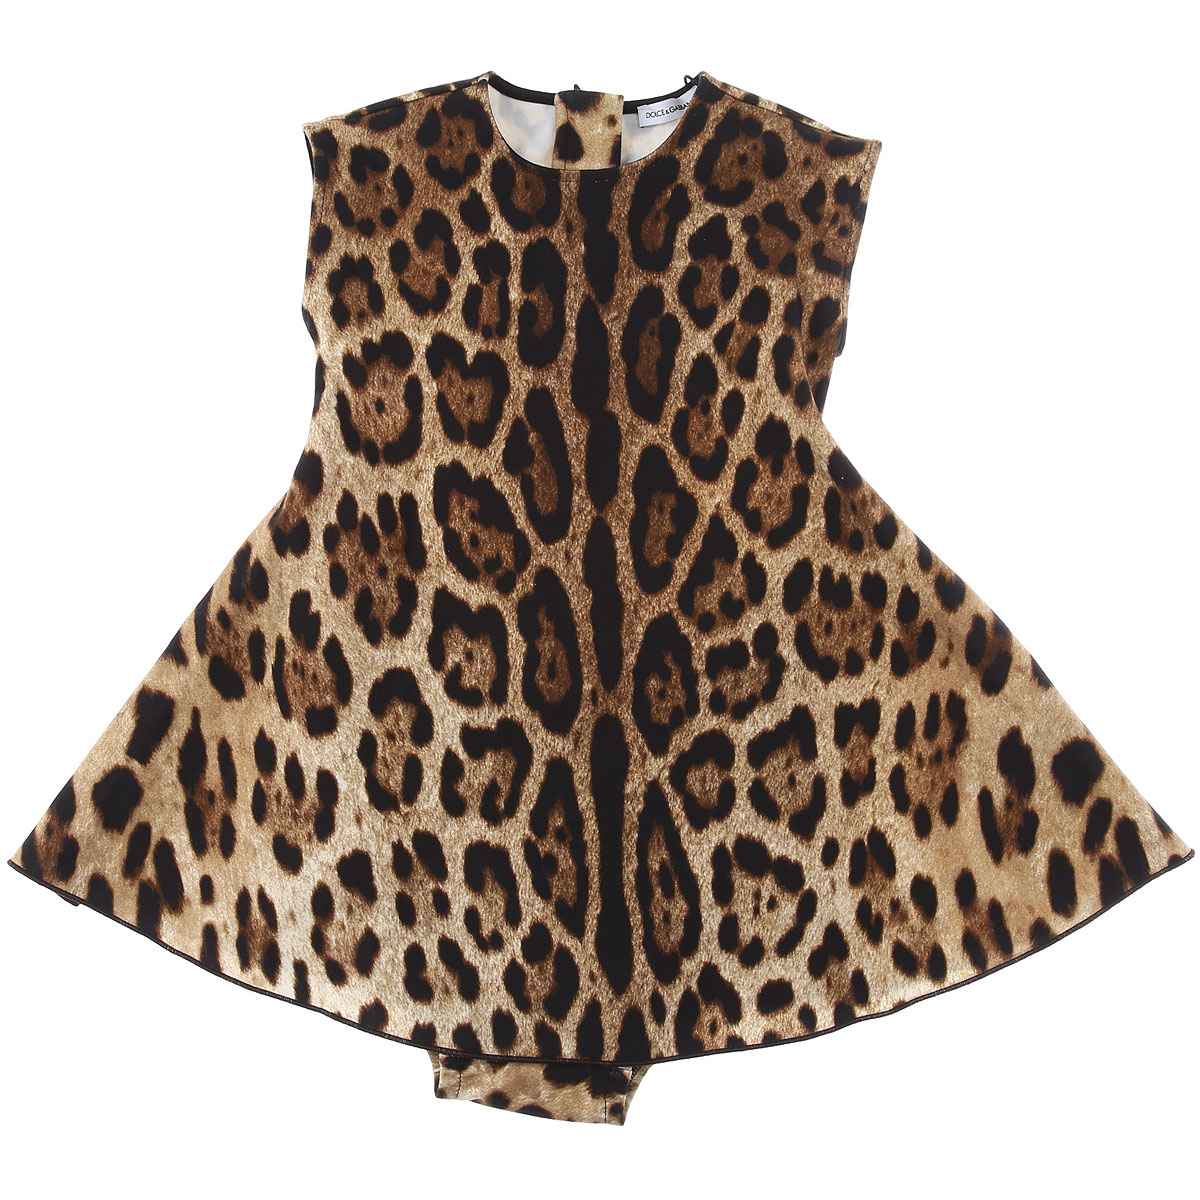 Dolce & Gabbana Baby Dress for Girls On Sale, Leopard, Cotton, 2019, 12M 18M 24M